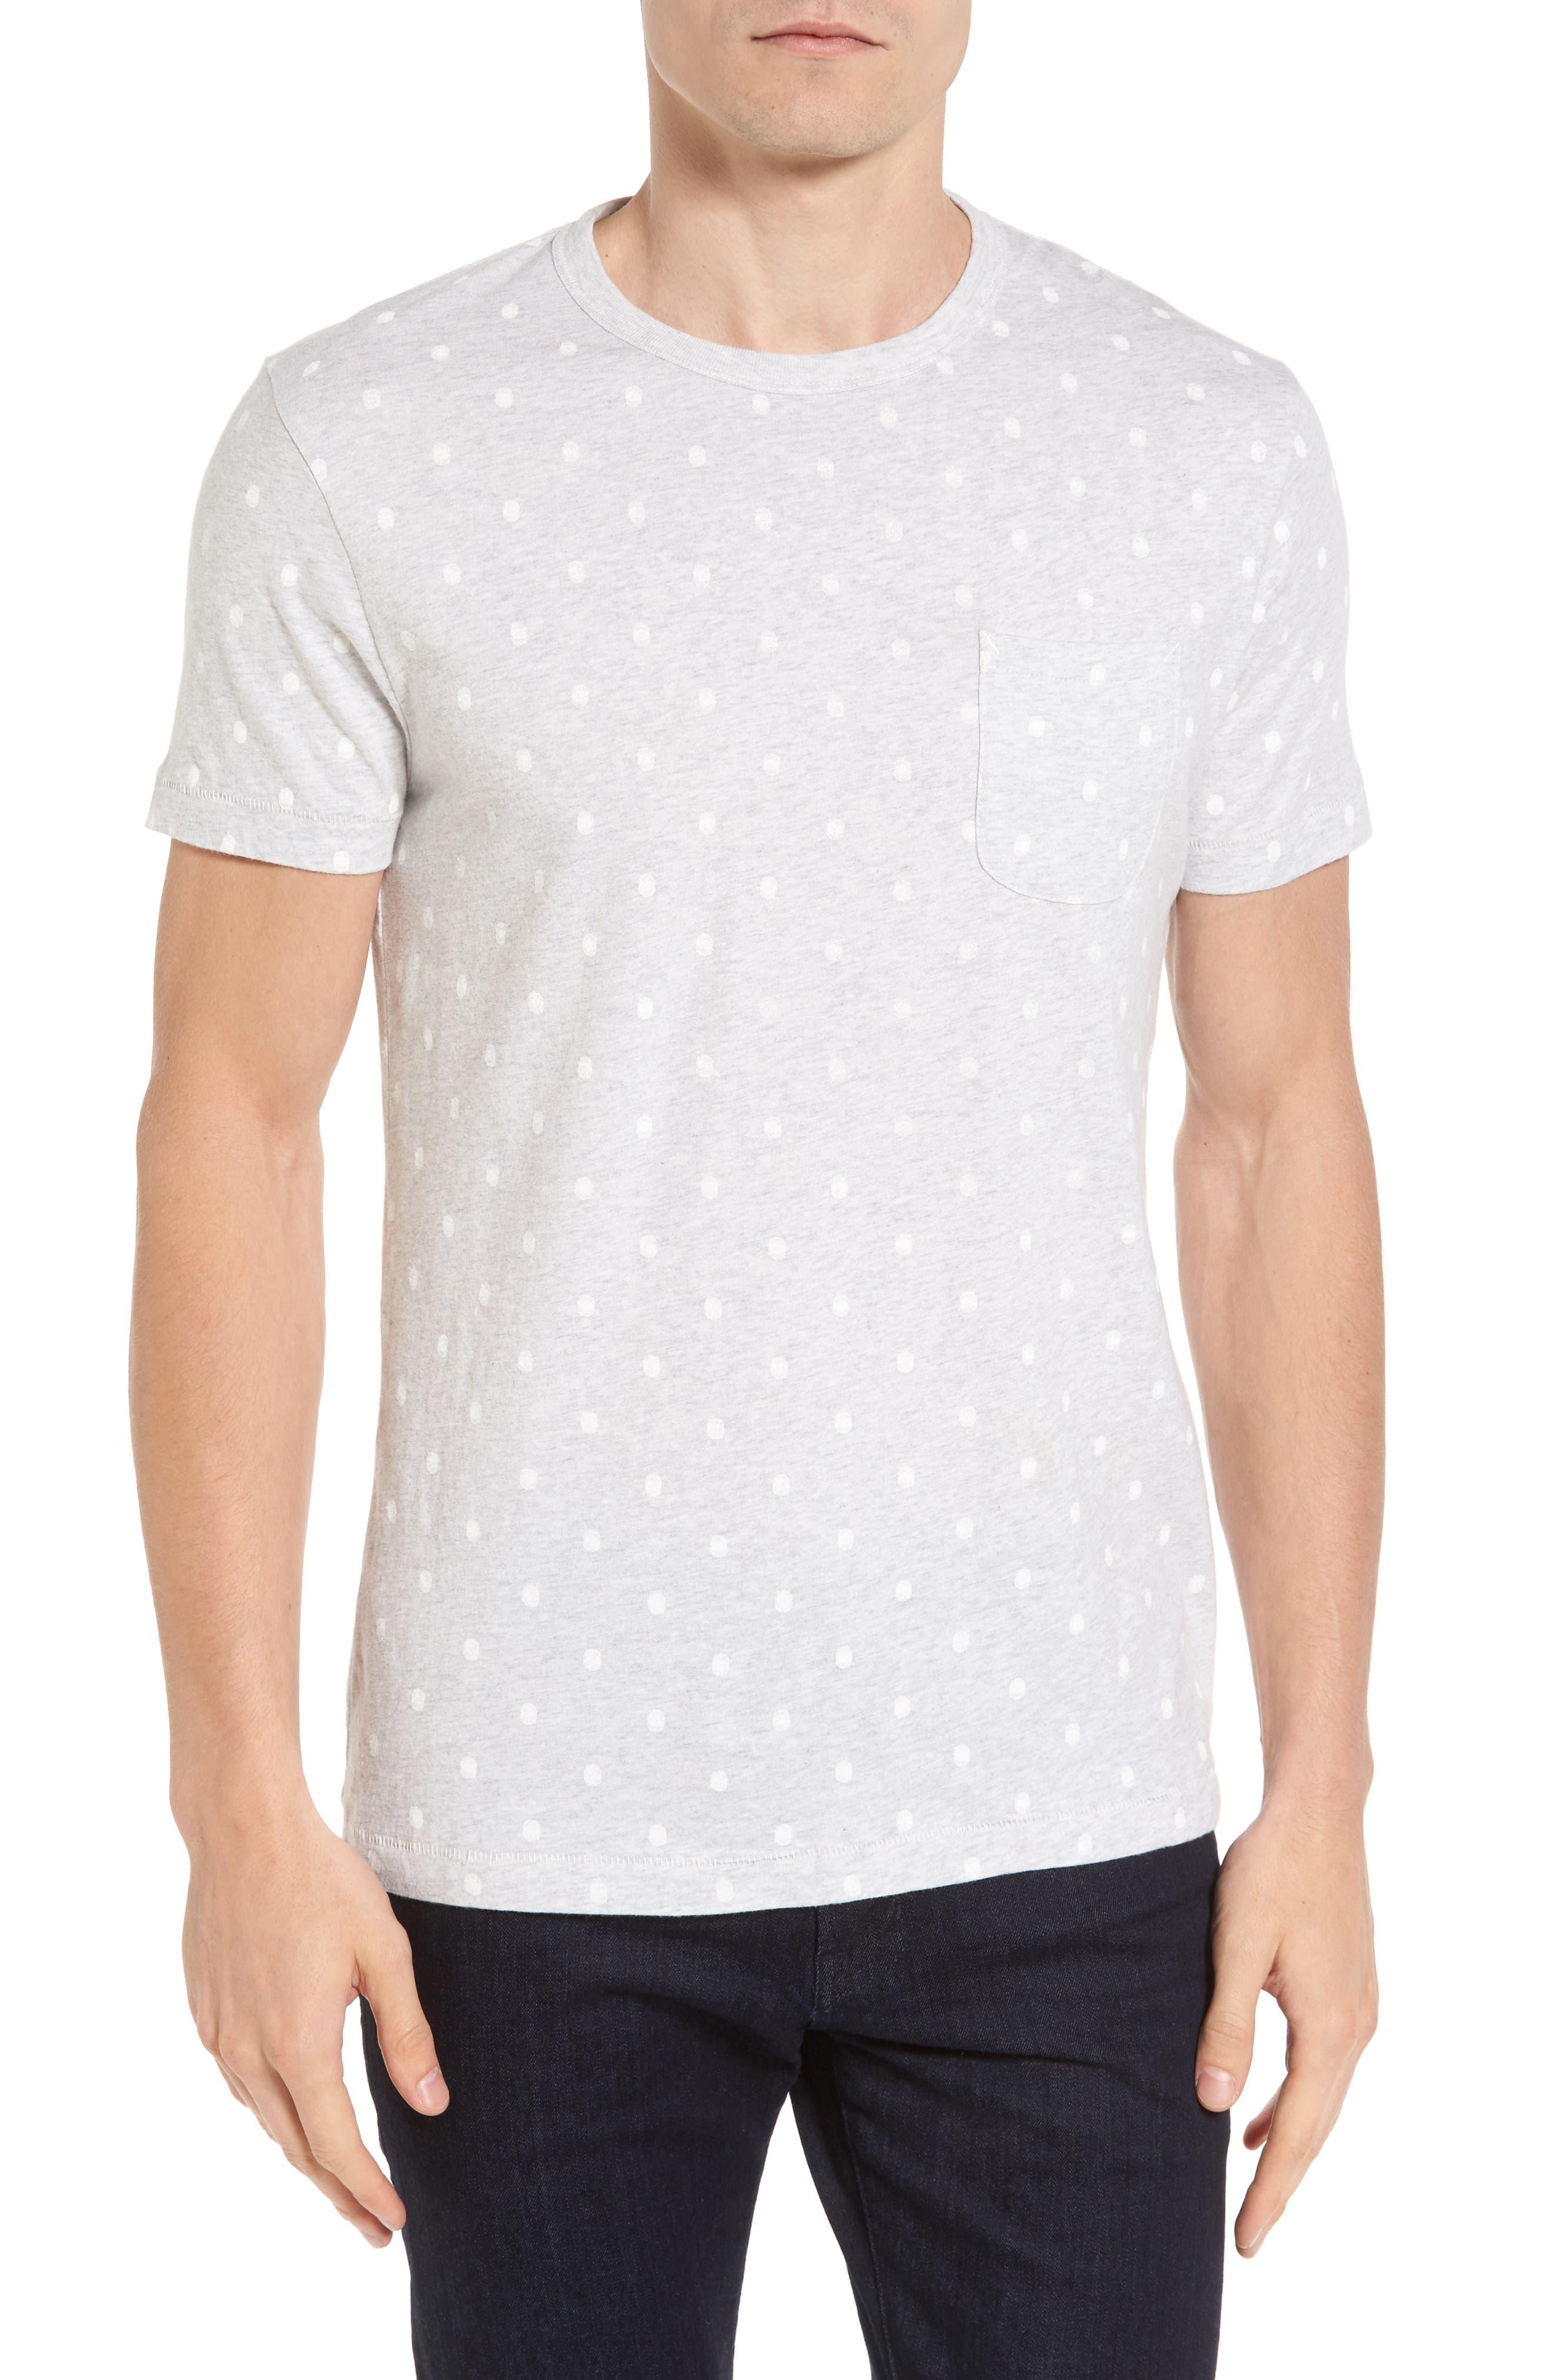 Polka Dot T-Shirt,                         Main,                         color, Silver Melange/ Whte